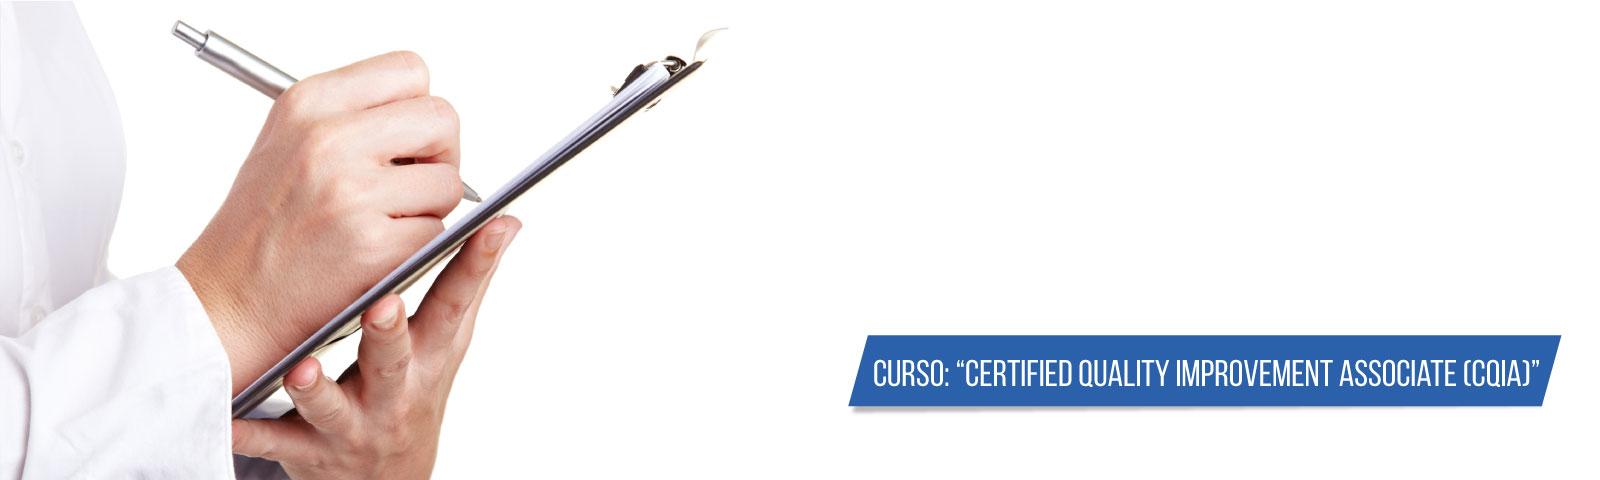 banners_web_cursos_1600x480_cqia_solo